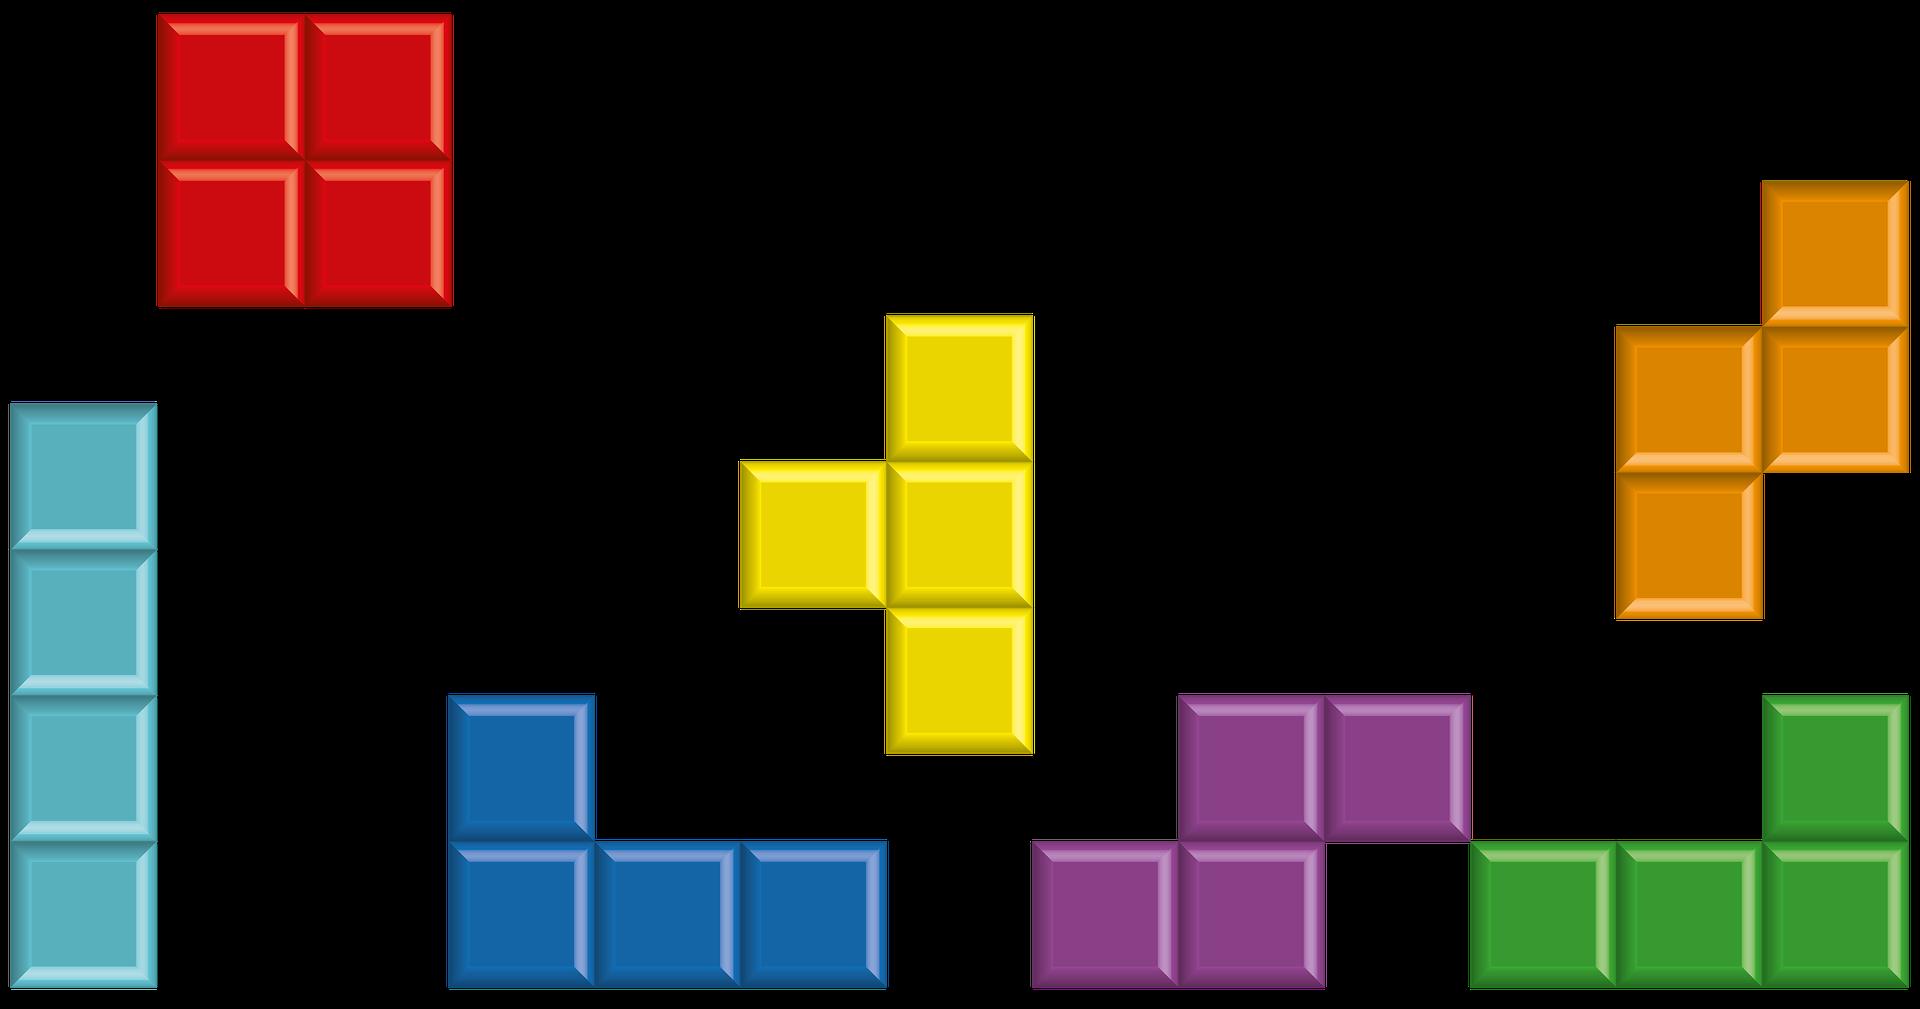 cube-1678974_1920